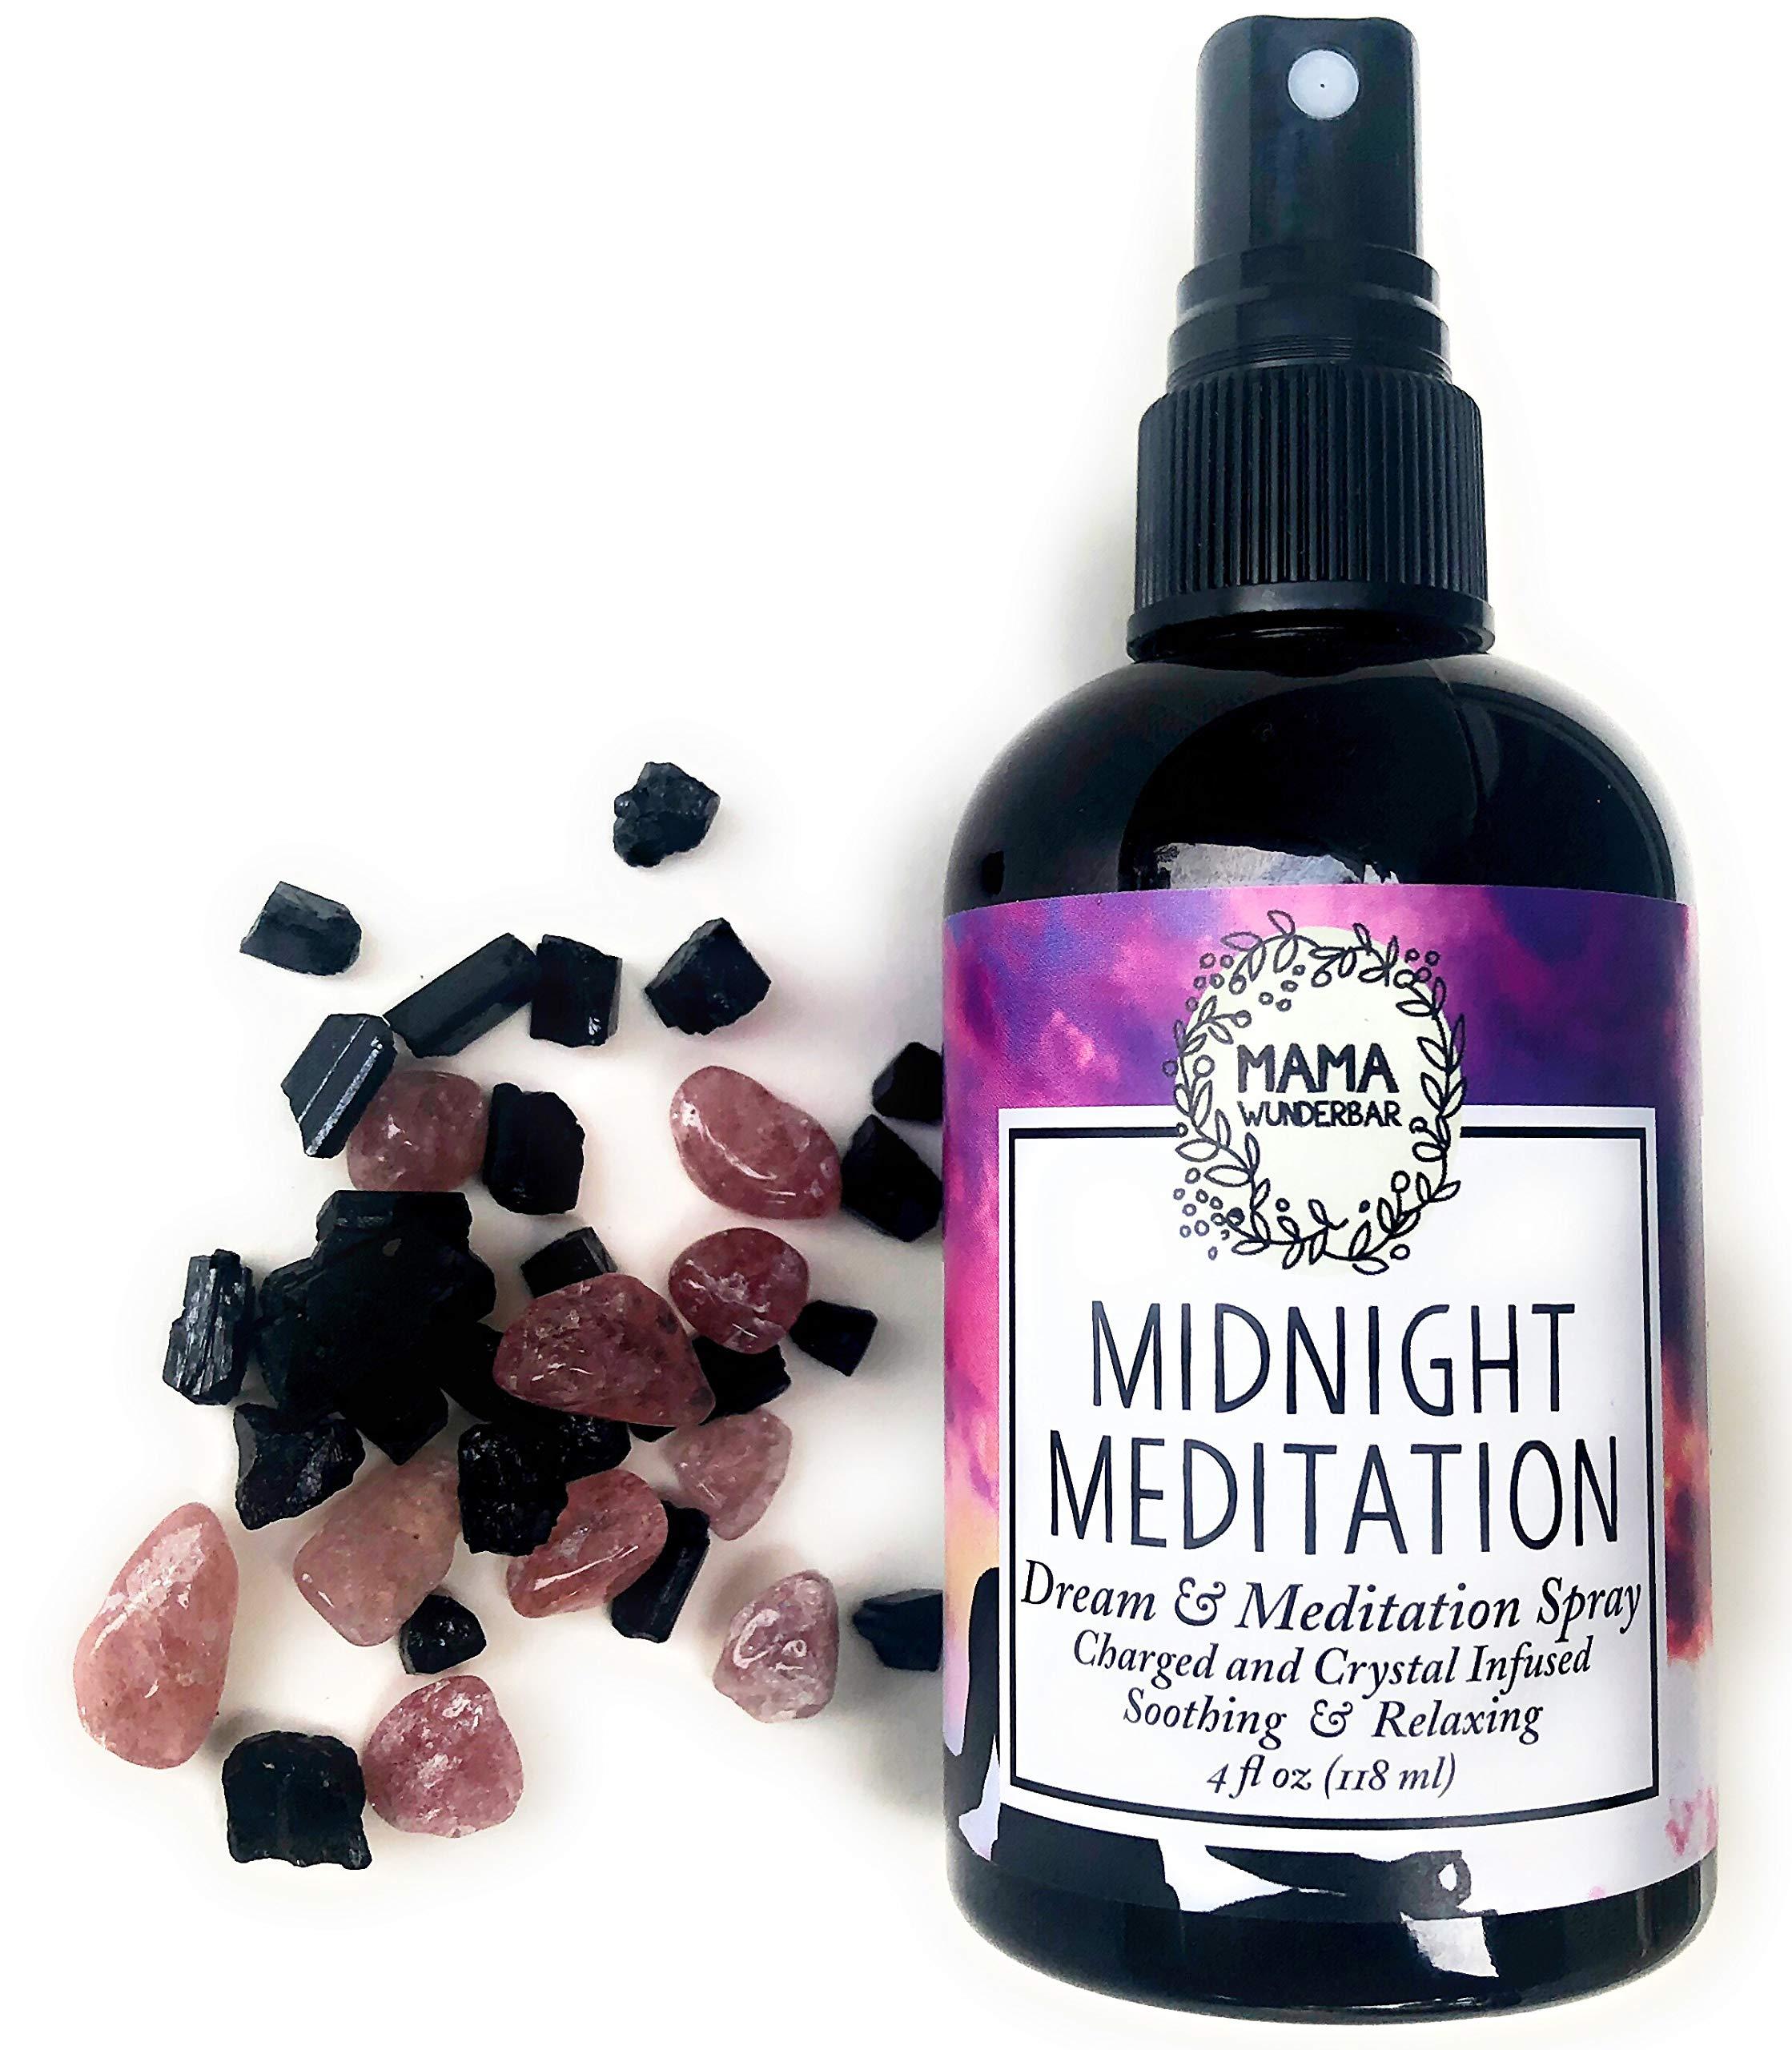 MAMA WUNDERBAR Sleep Spray Midnight Meditation - Dream Spray - Linen, Lavender, Tulsi, Elemi. Crystal Infused Pillow Mist. by MAMA WUNDERBAR